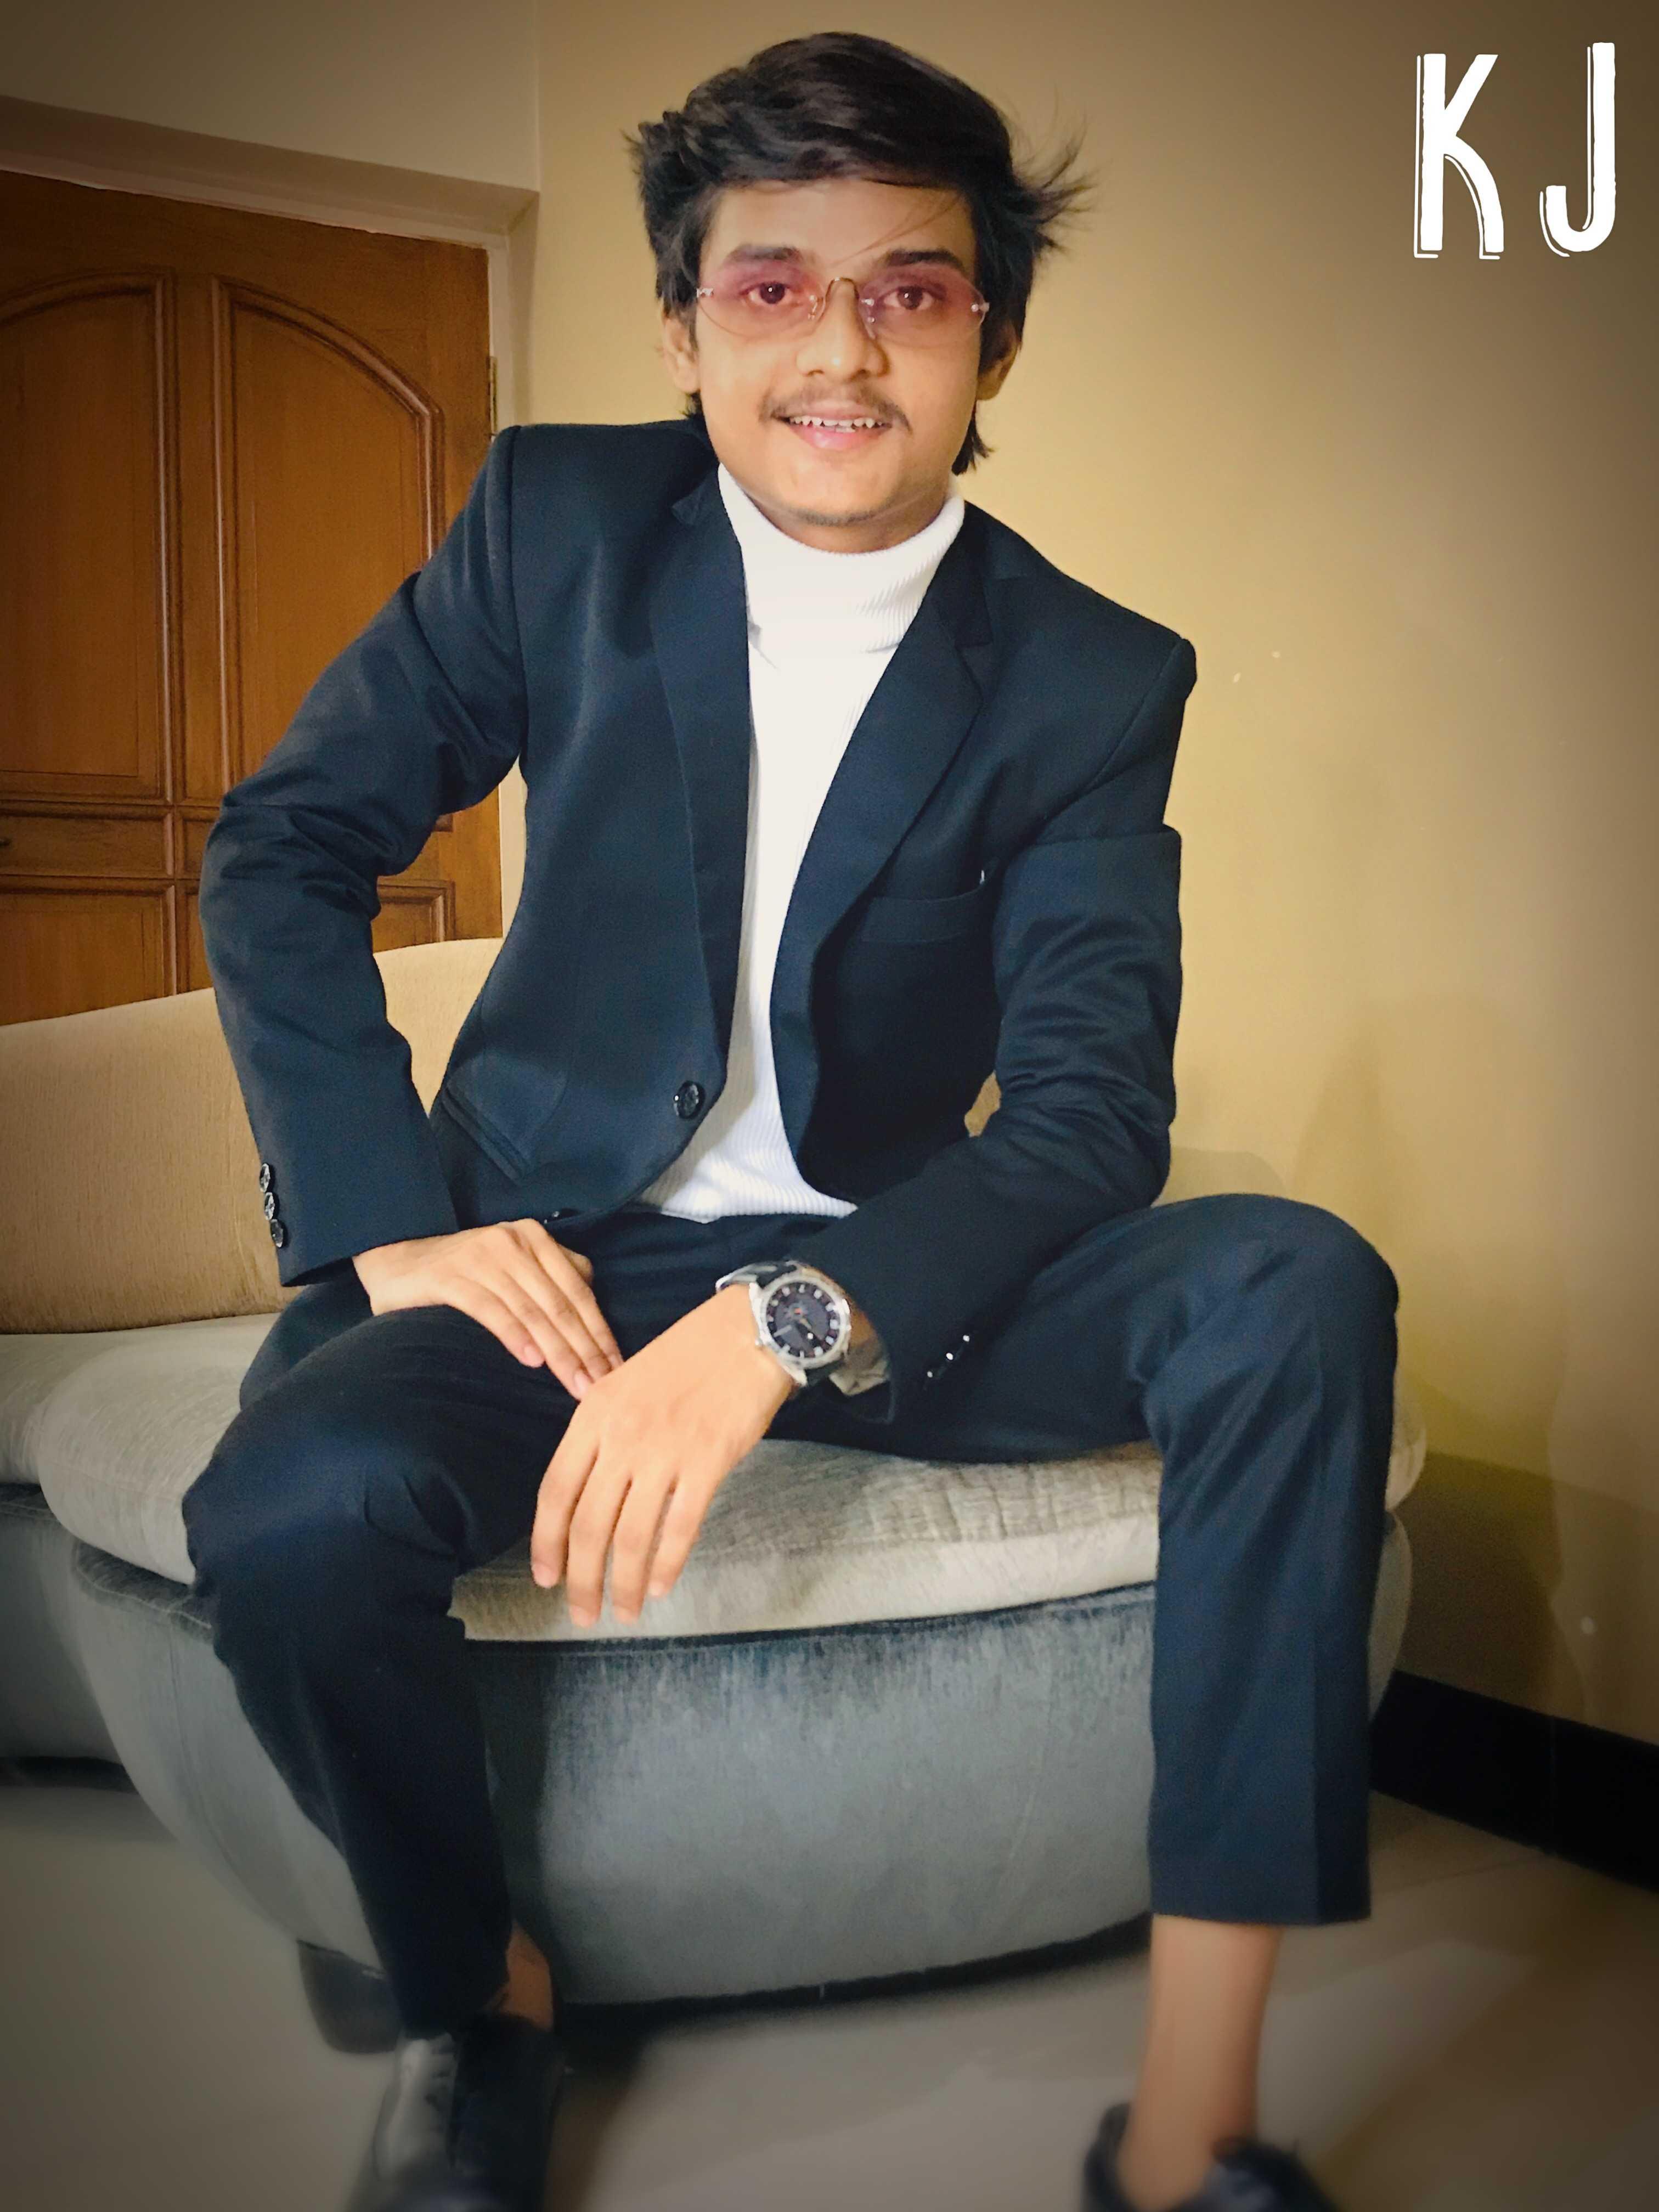 Kamal Jain KJ Profile Picture